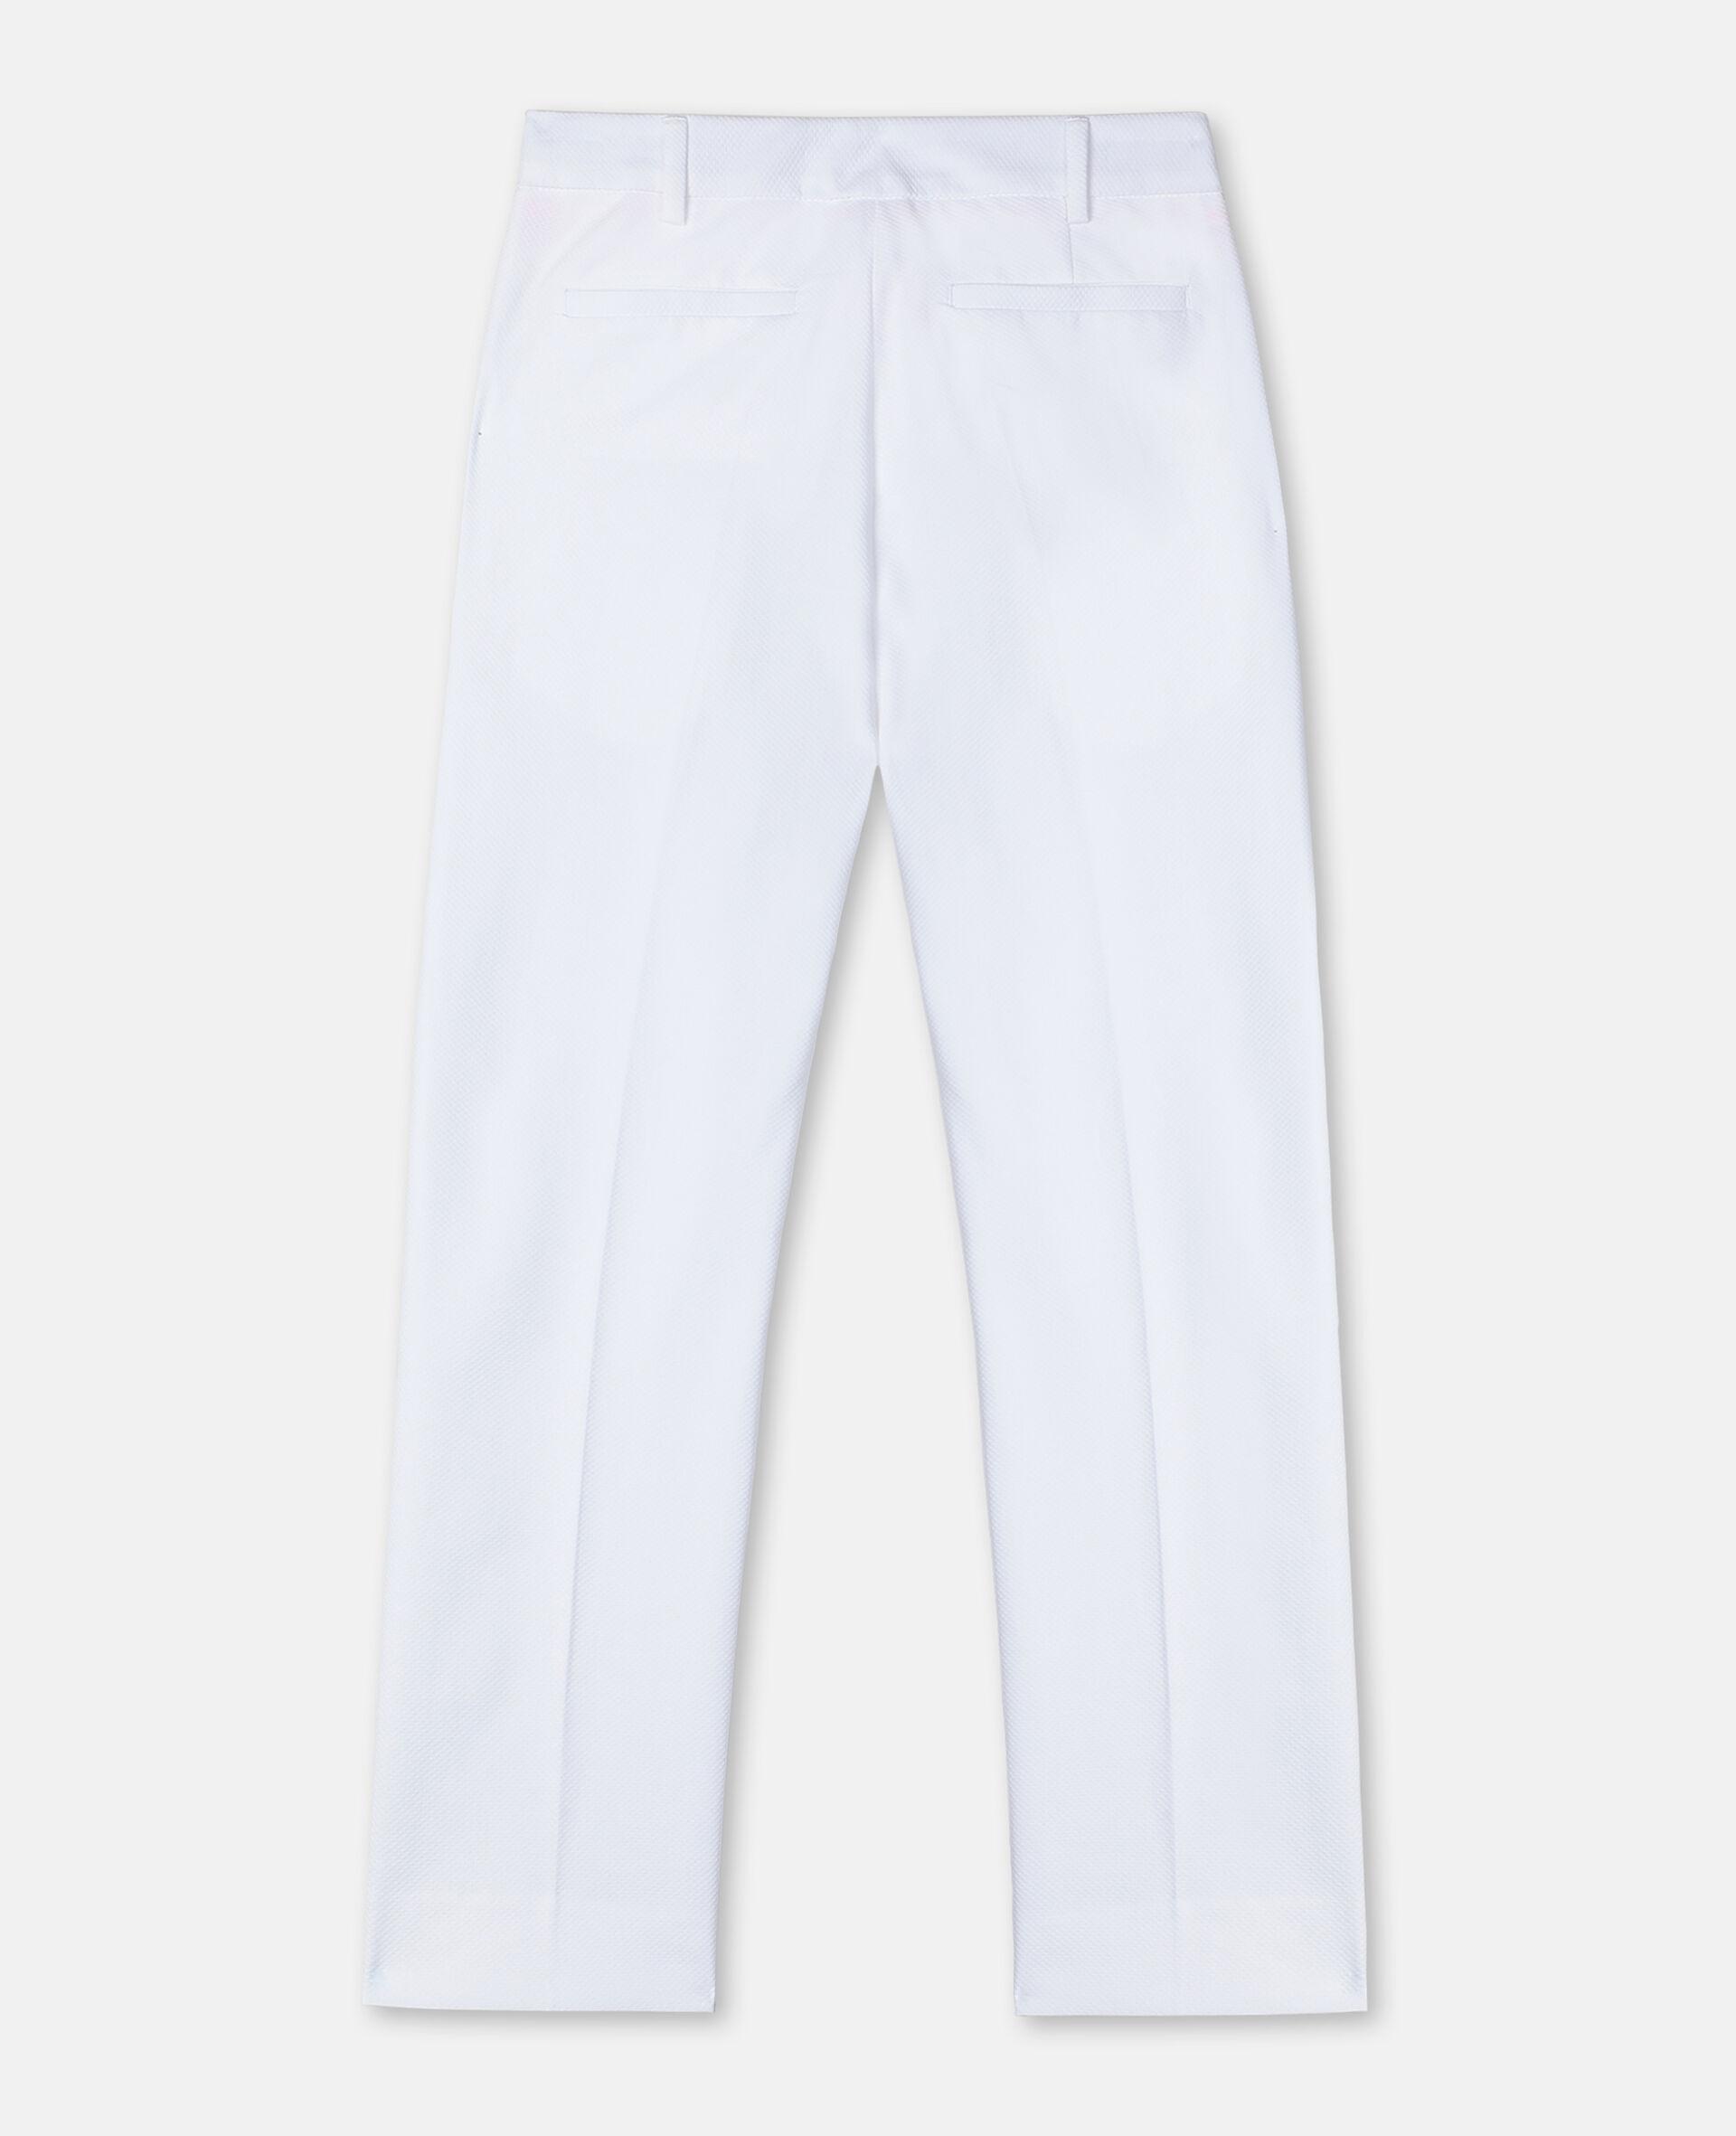 棉质珠地布西装裤-白色-large image number 3